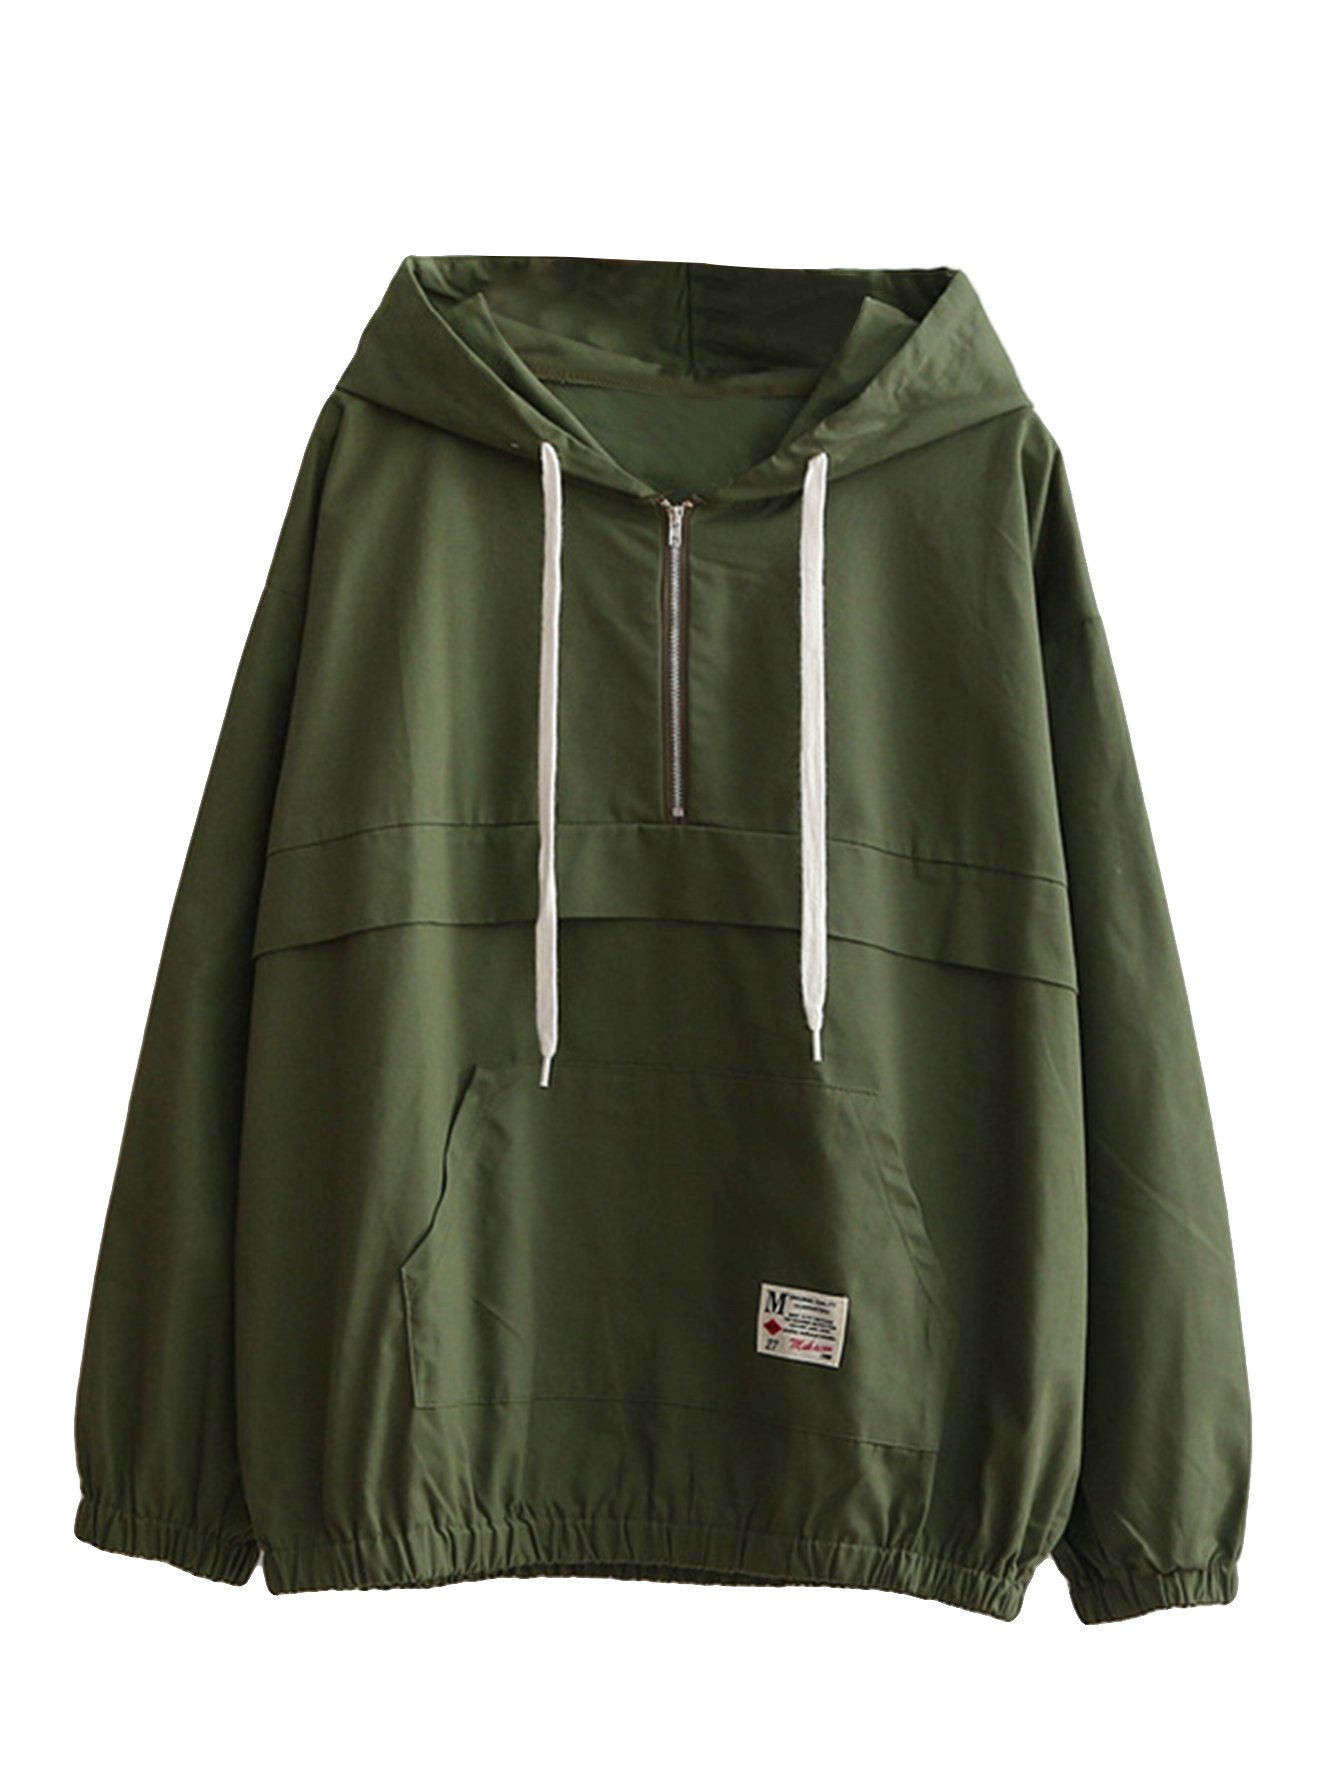 Romwe Women's Lightweight Kangaroo Pocket Anorak Sports Jacket Drawstring Hooded Zip up Windproof Windbreaker Army-Green S